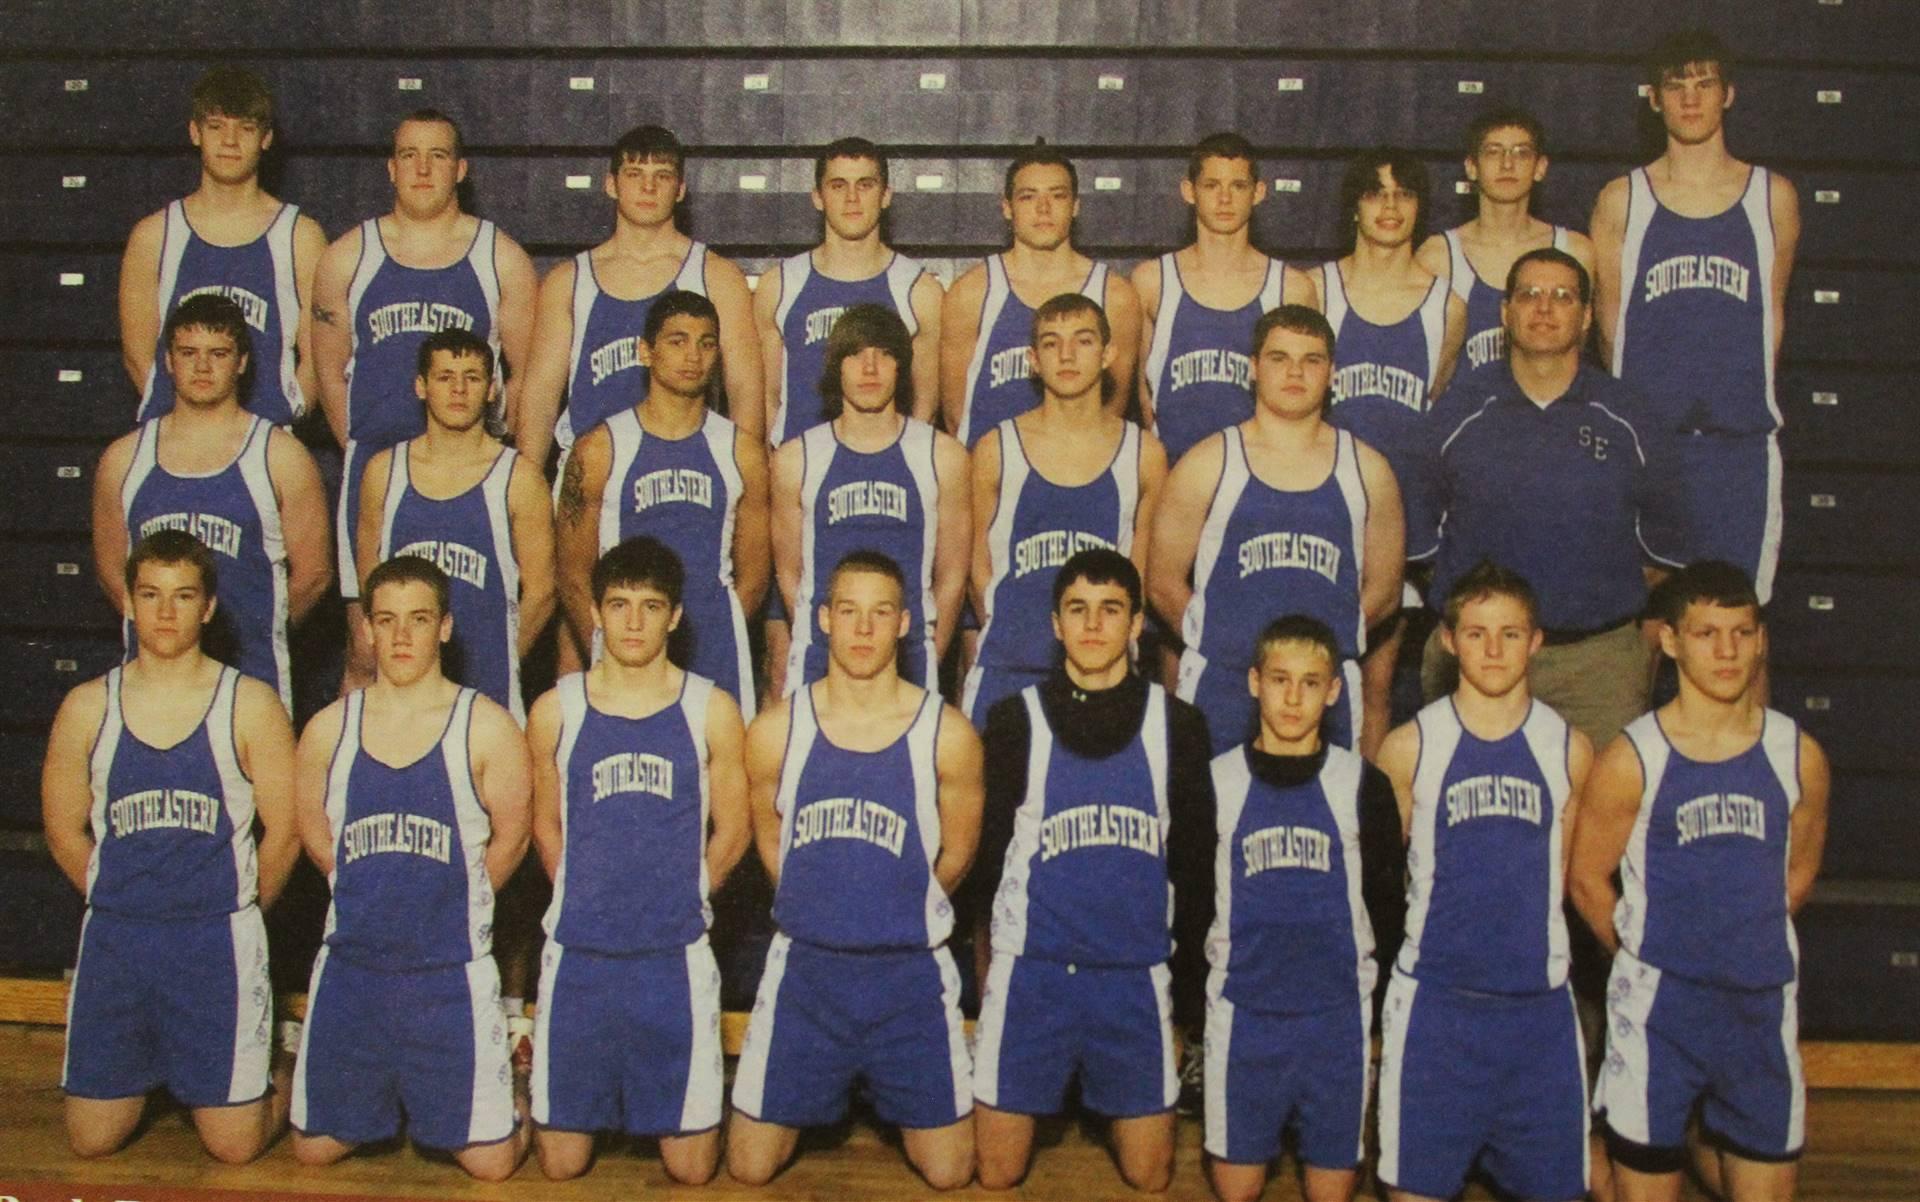 2008 boys track